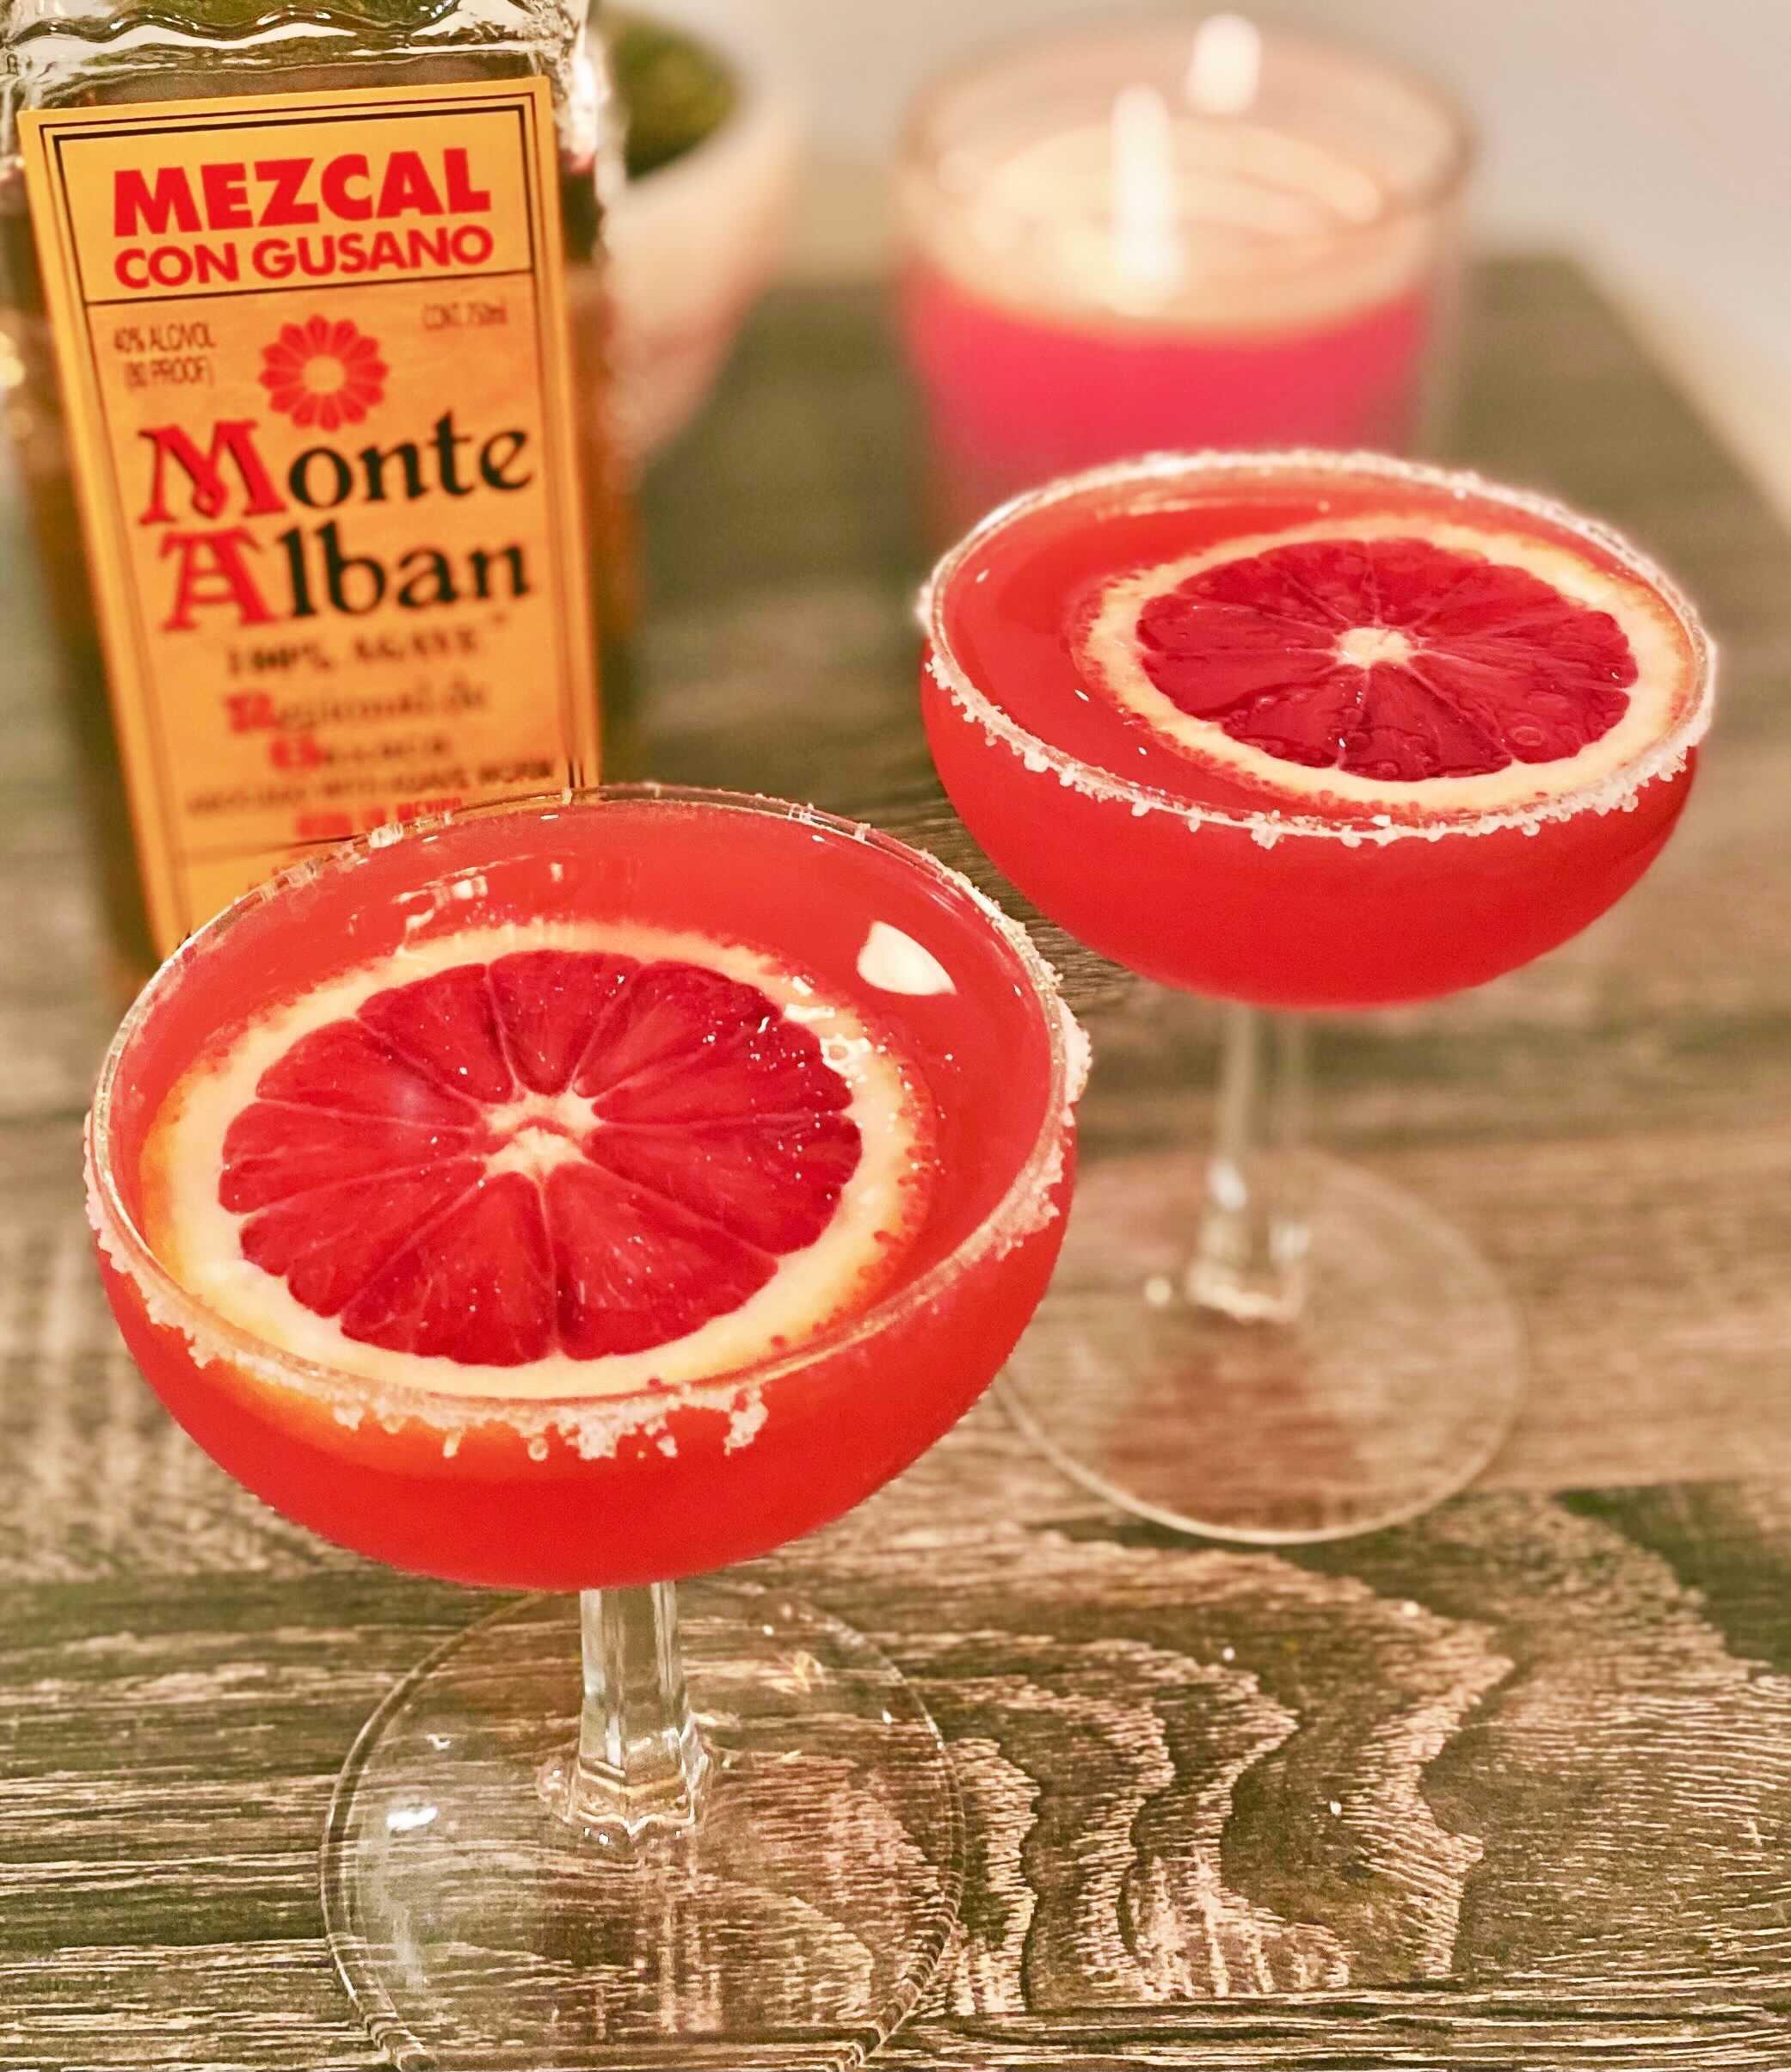 Blood Orange Margarita with Mezcal Tequila